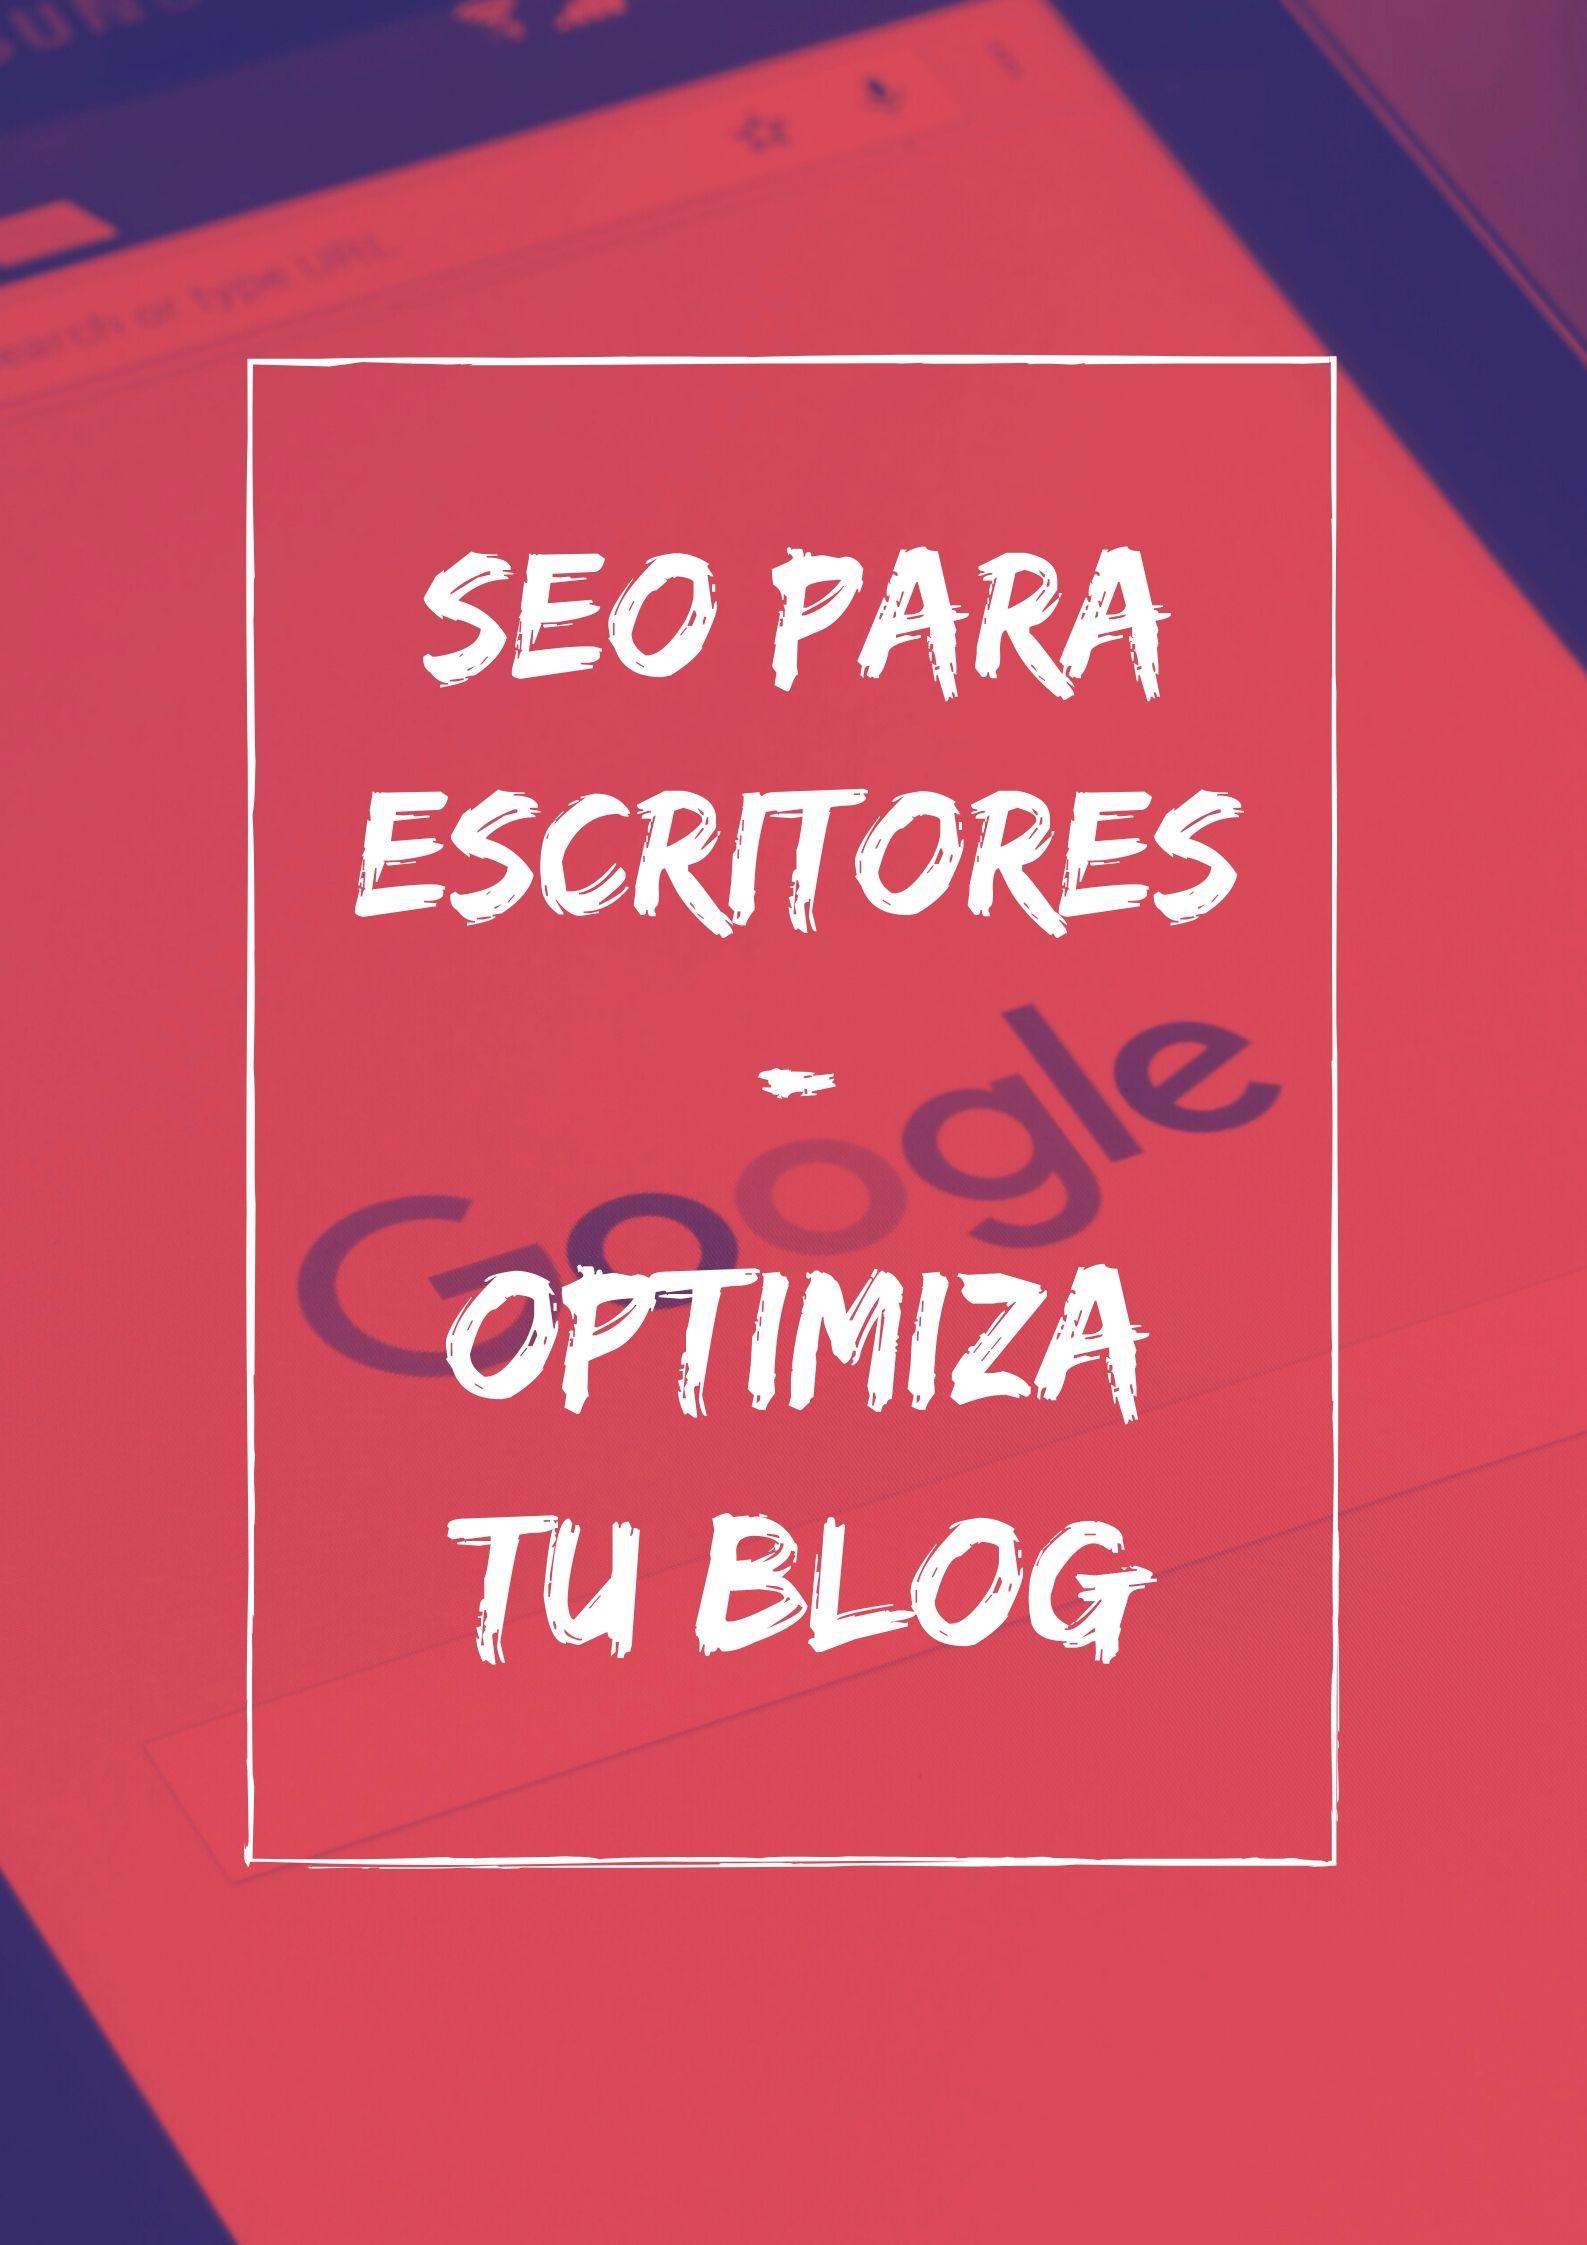 SEO para escritores: pasos básicos para optimizar tu blog